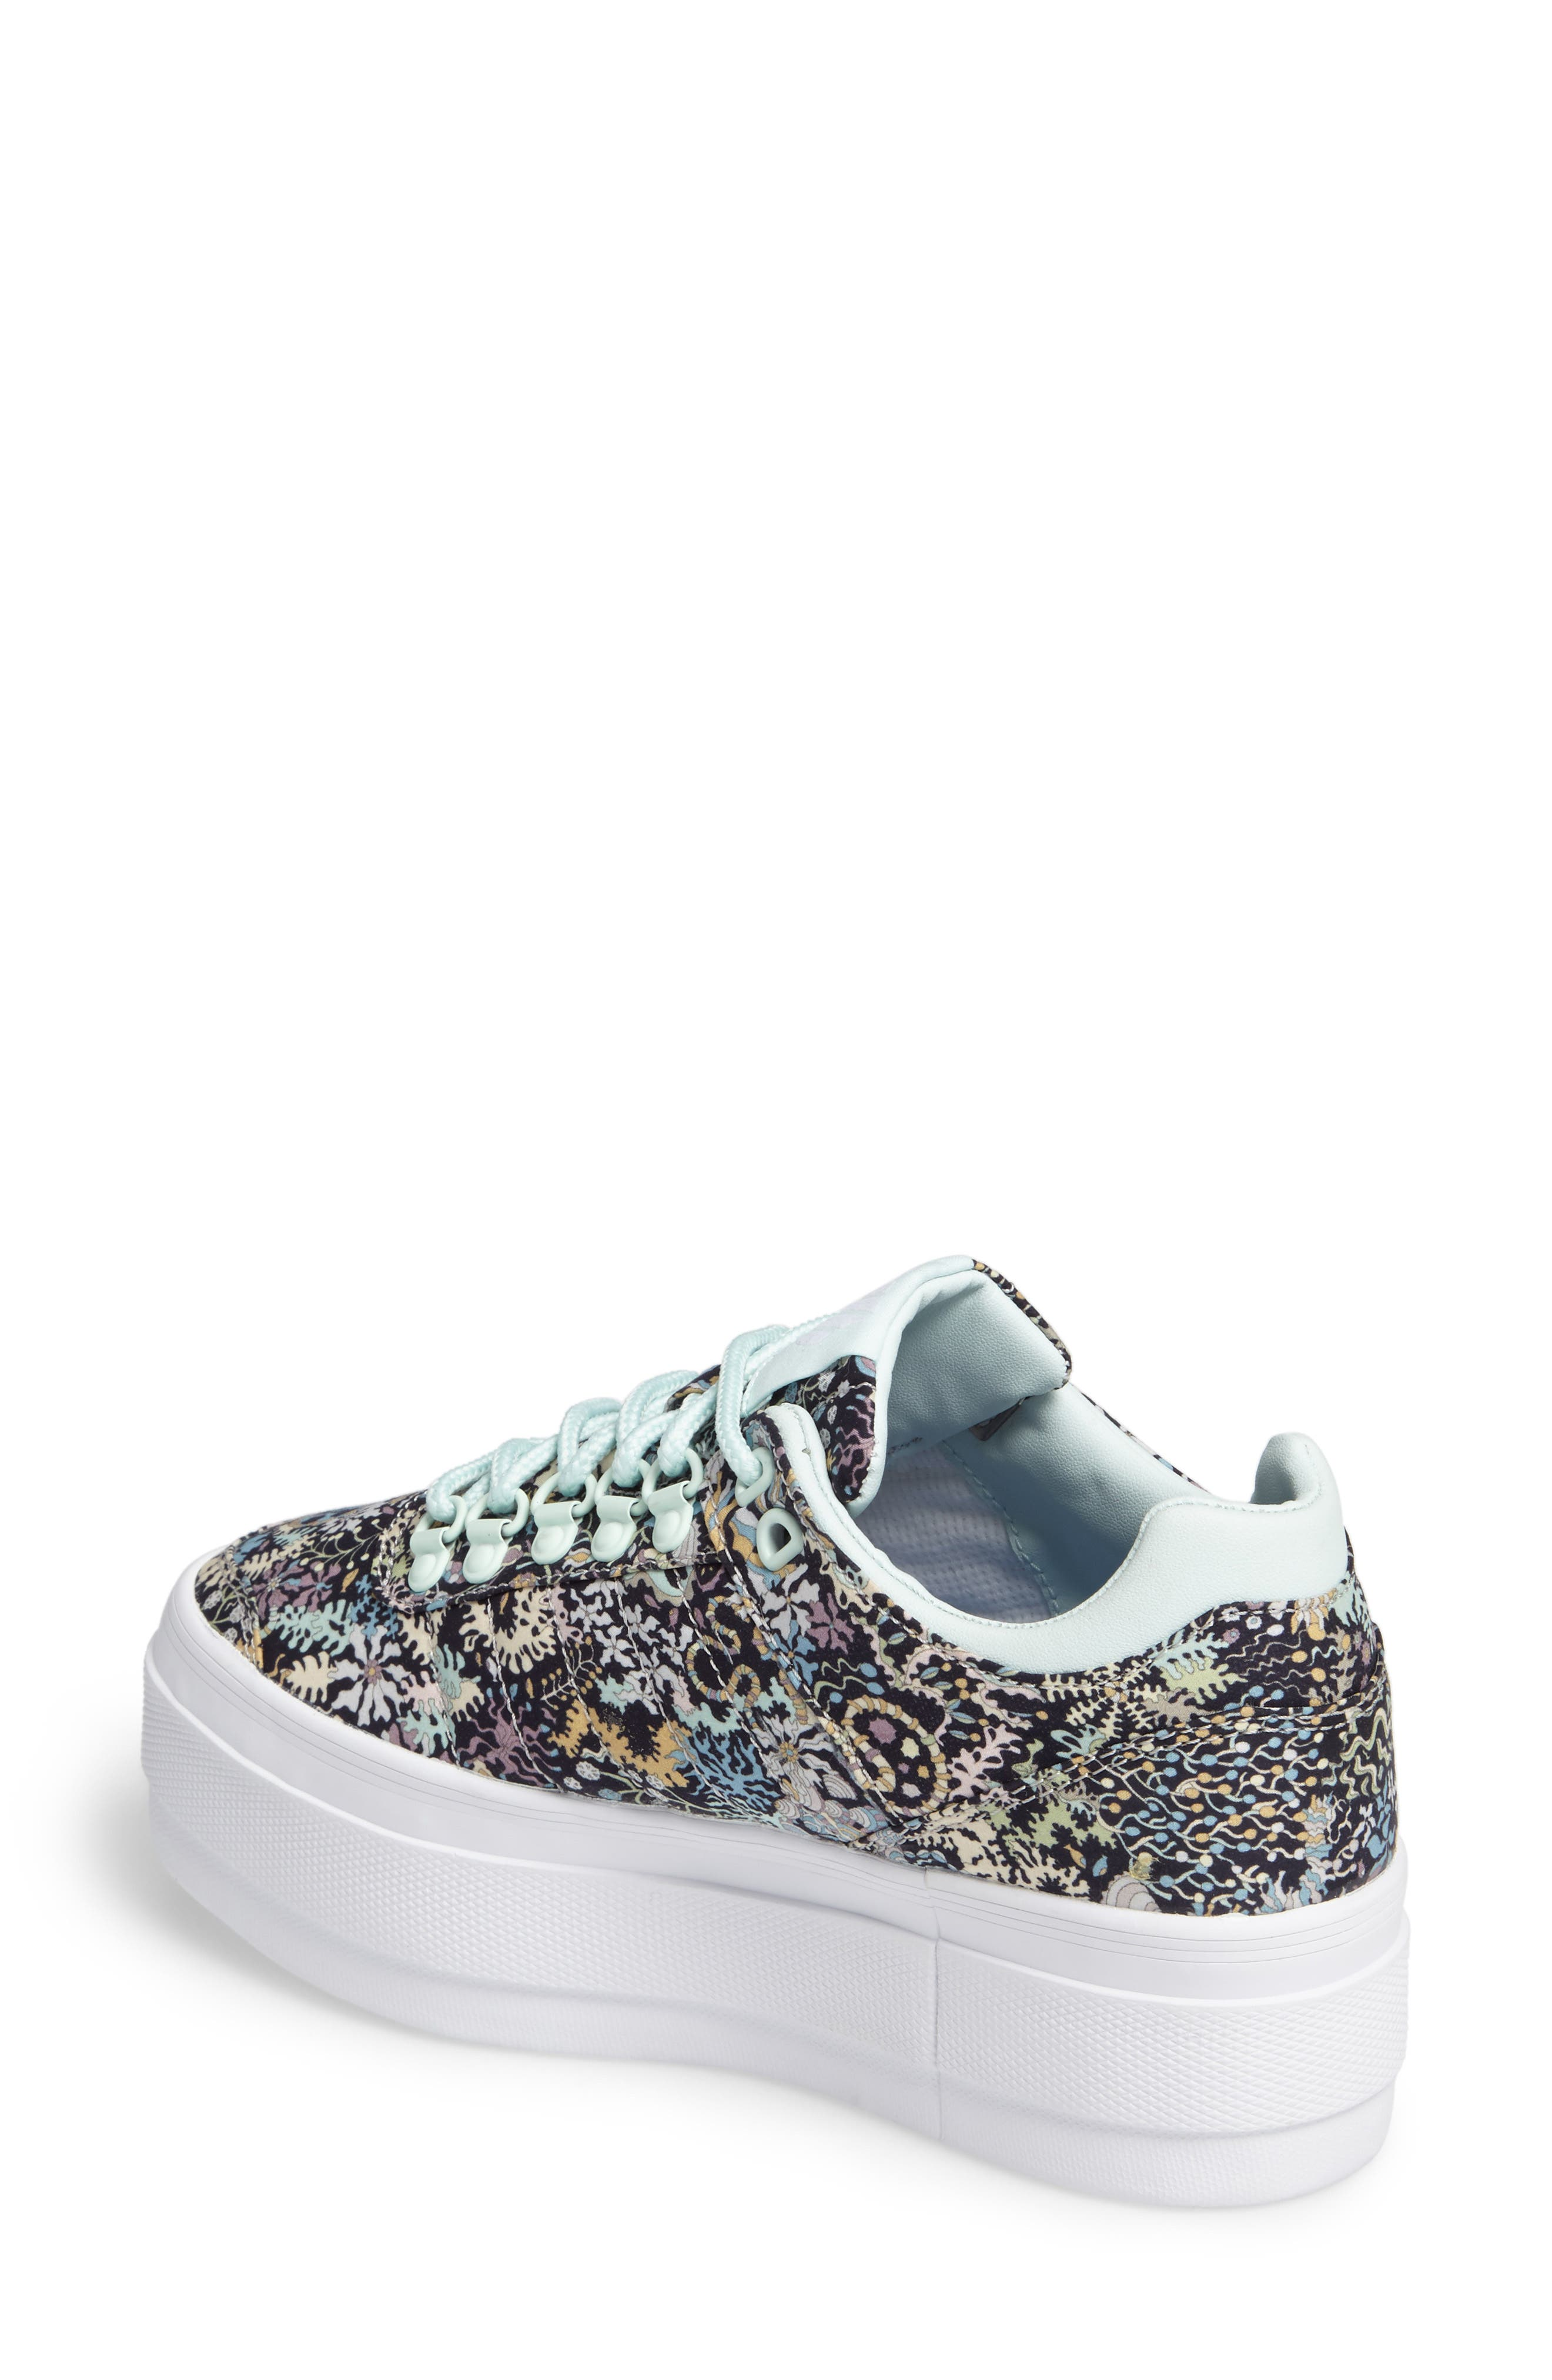 Gstaad Flatform Sneaker,                             Alternate thumbnail 2, color,                             040